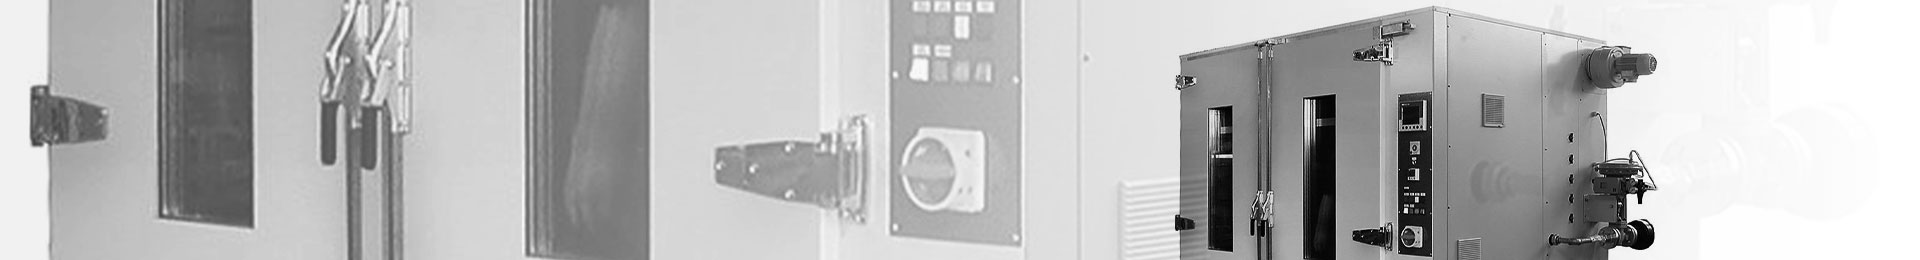 HORO heating cabinets with vacuum system_Headerbild